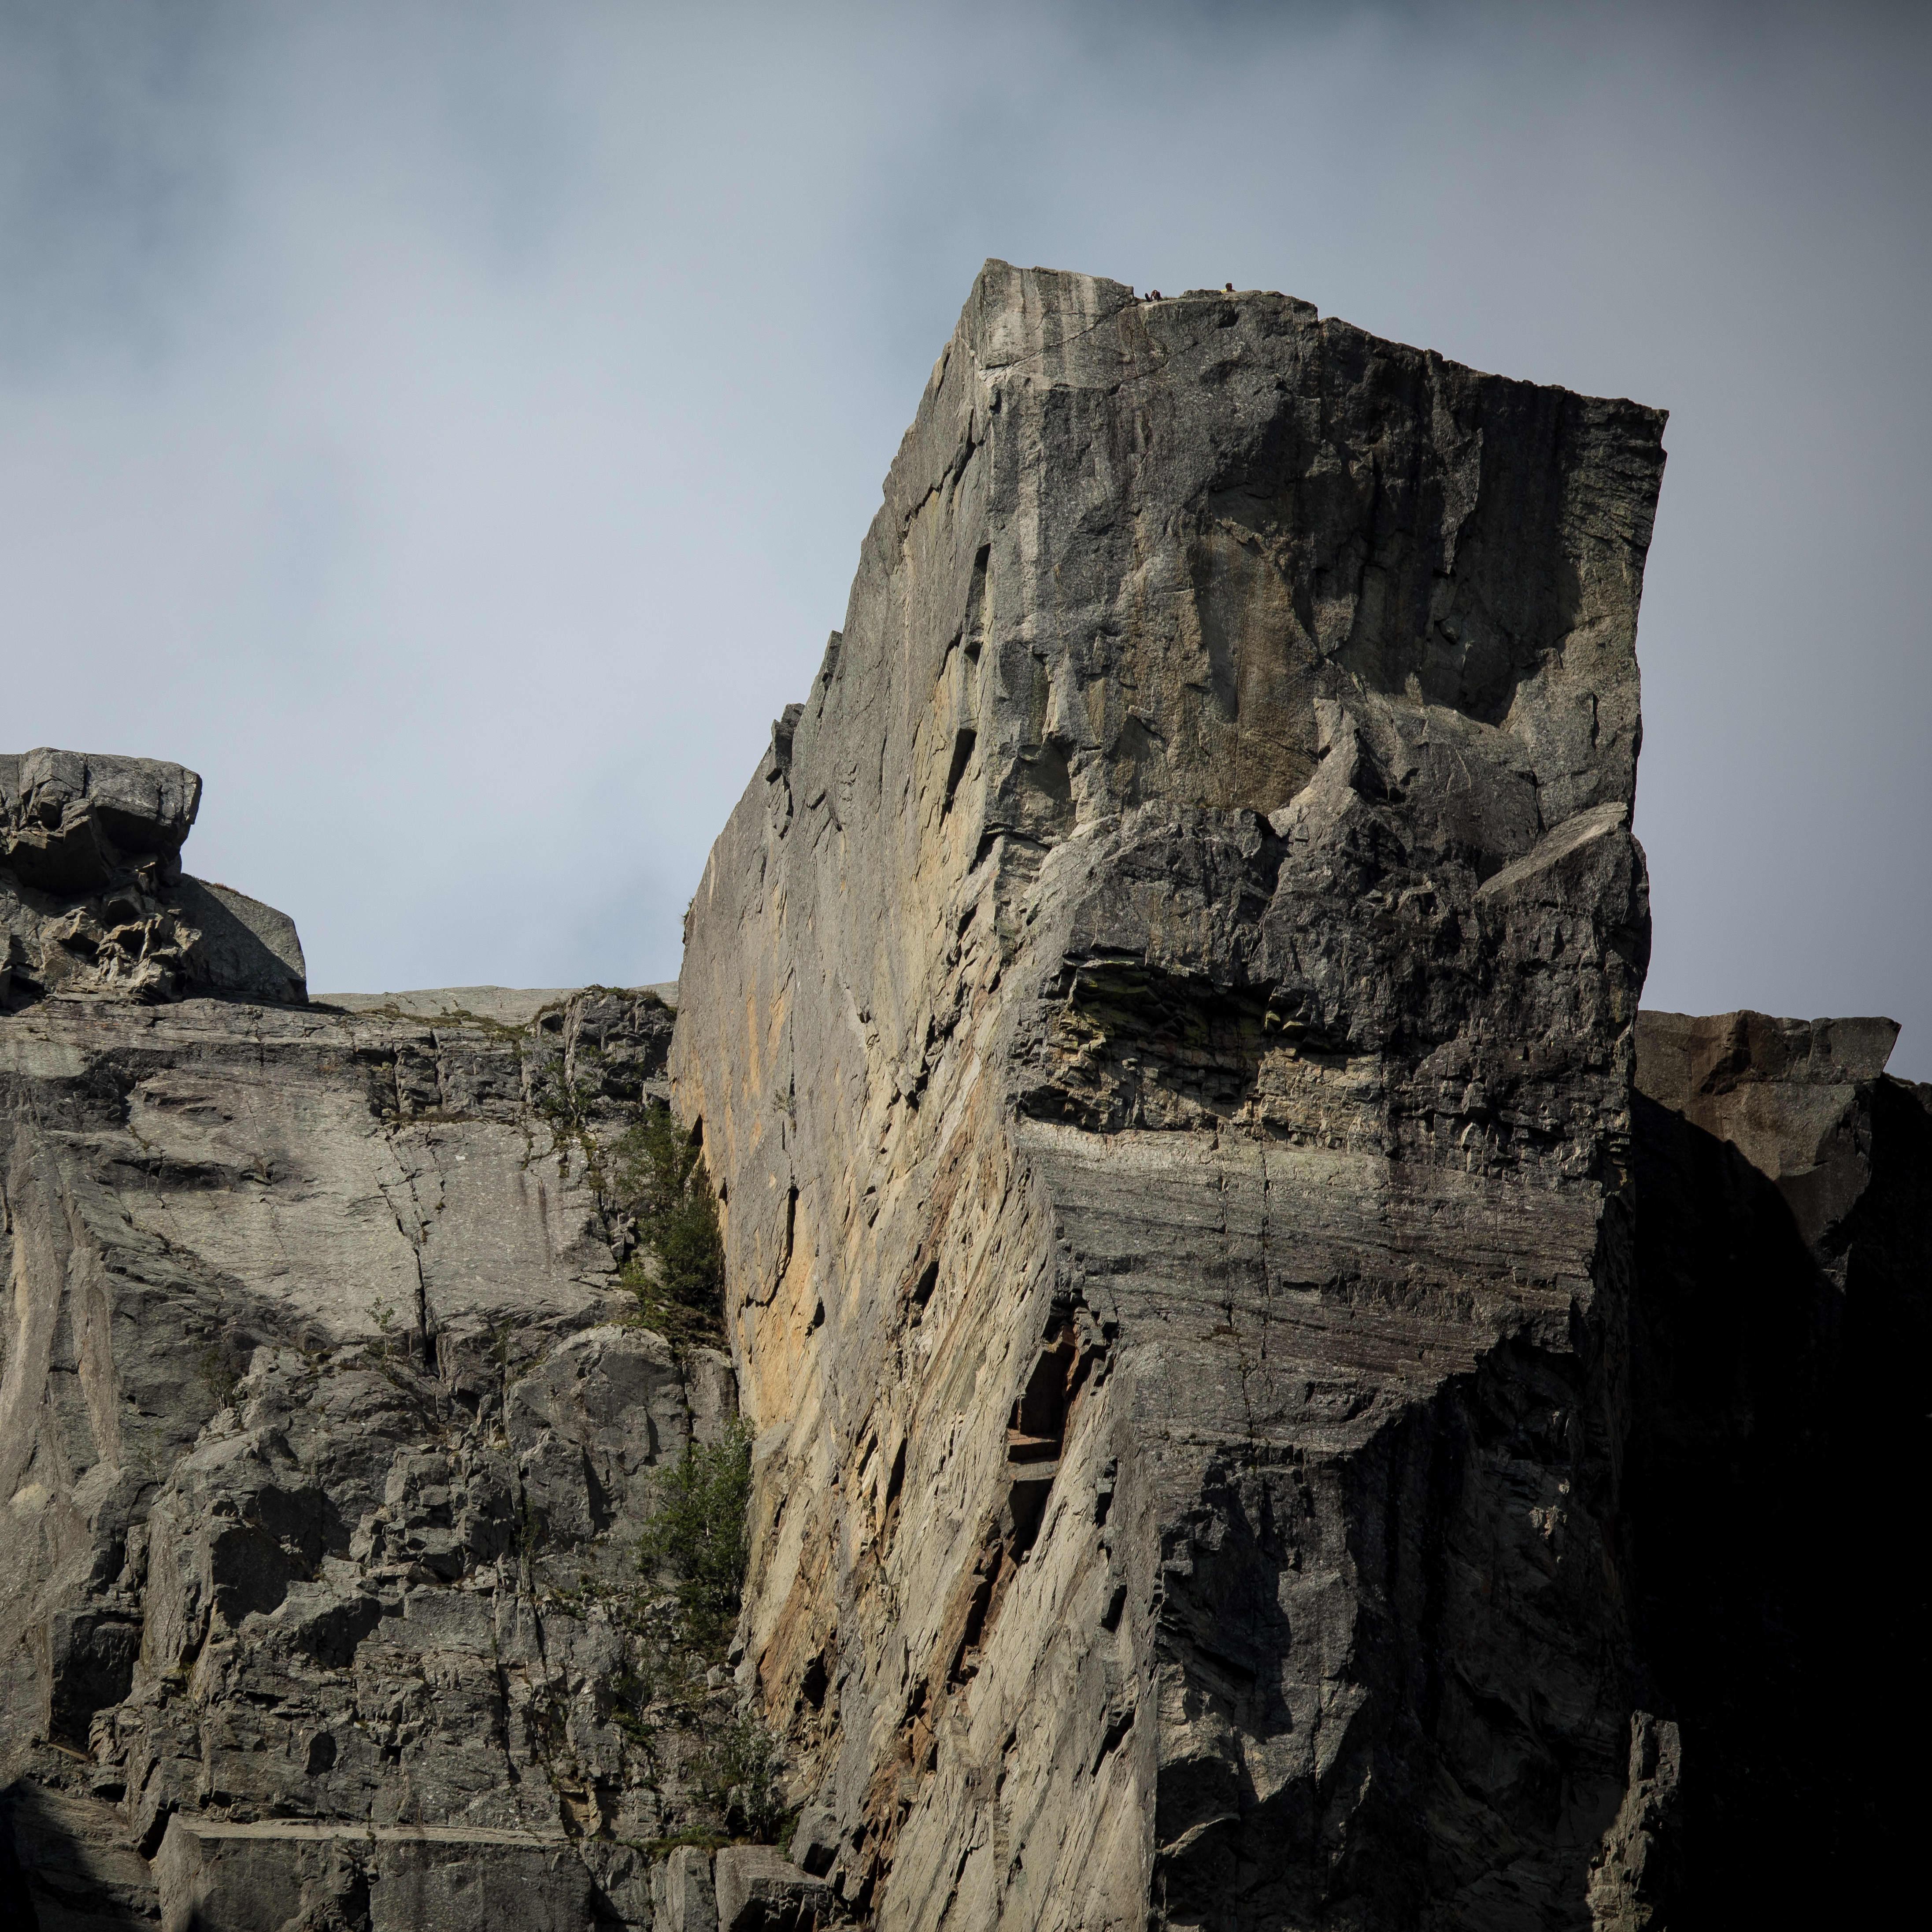 Preiekstolen rock formation seen from the Lysefjord below.